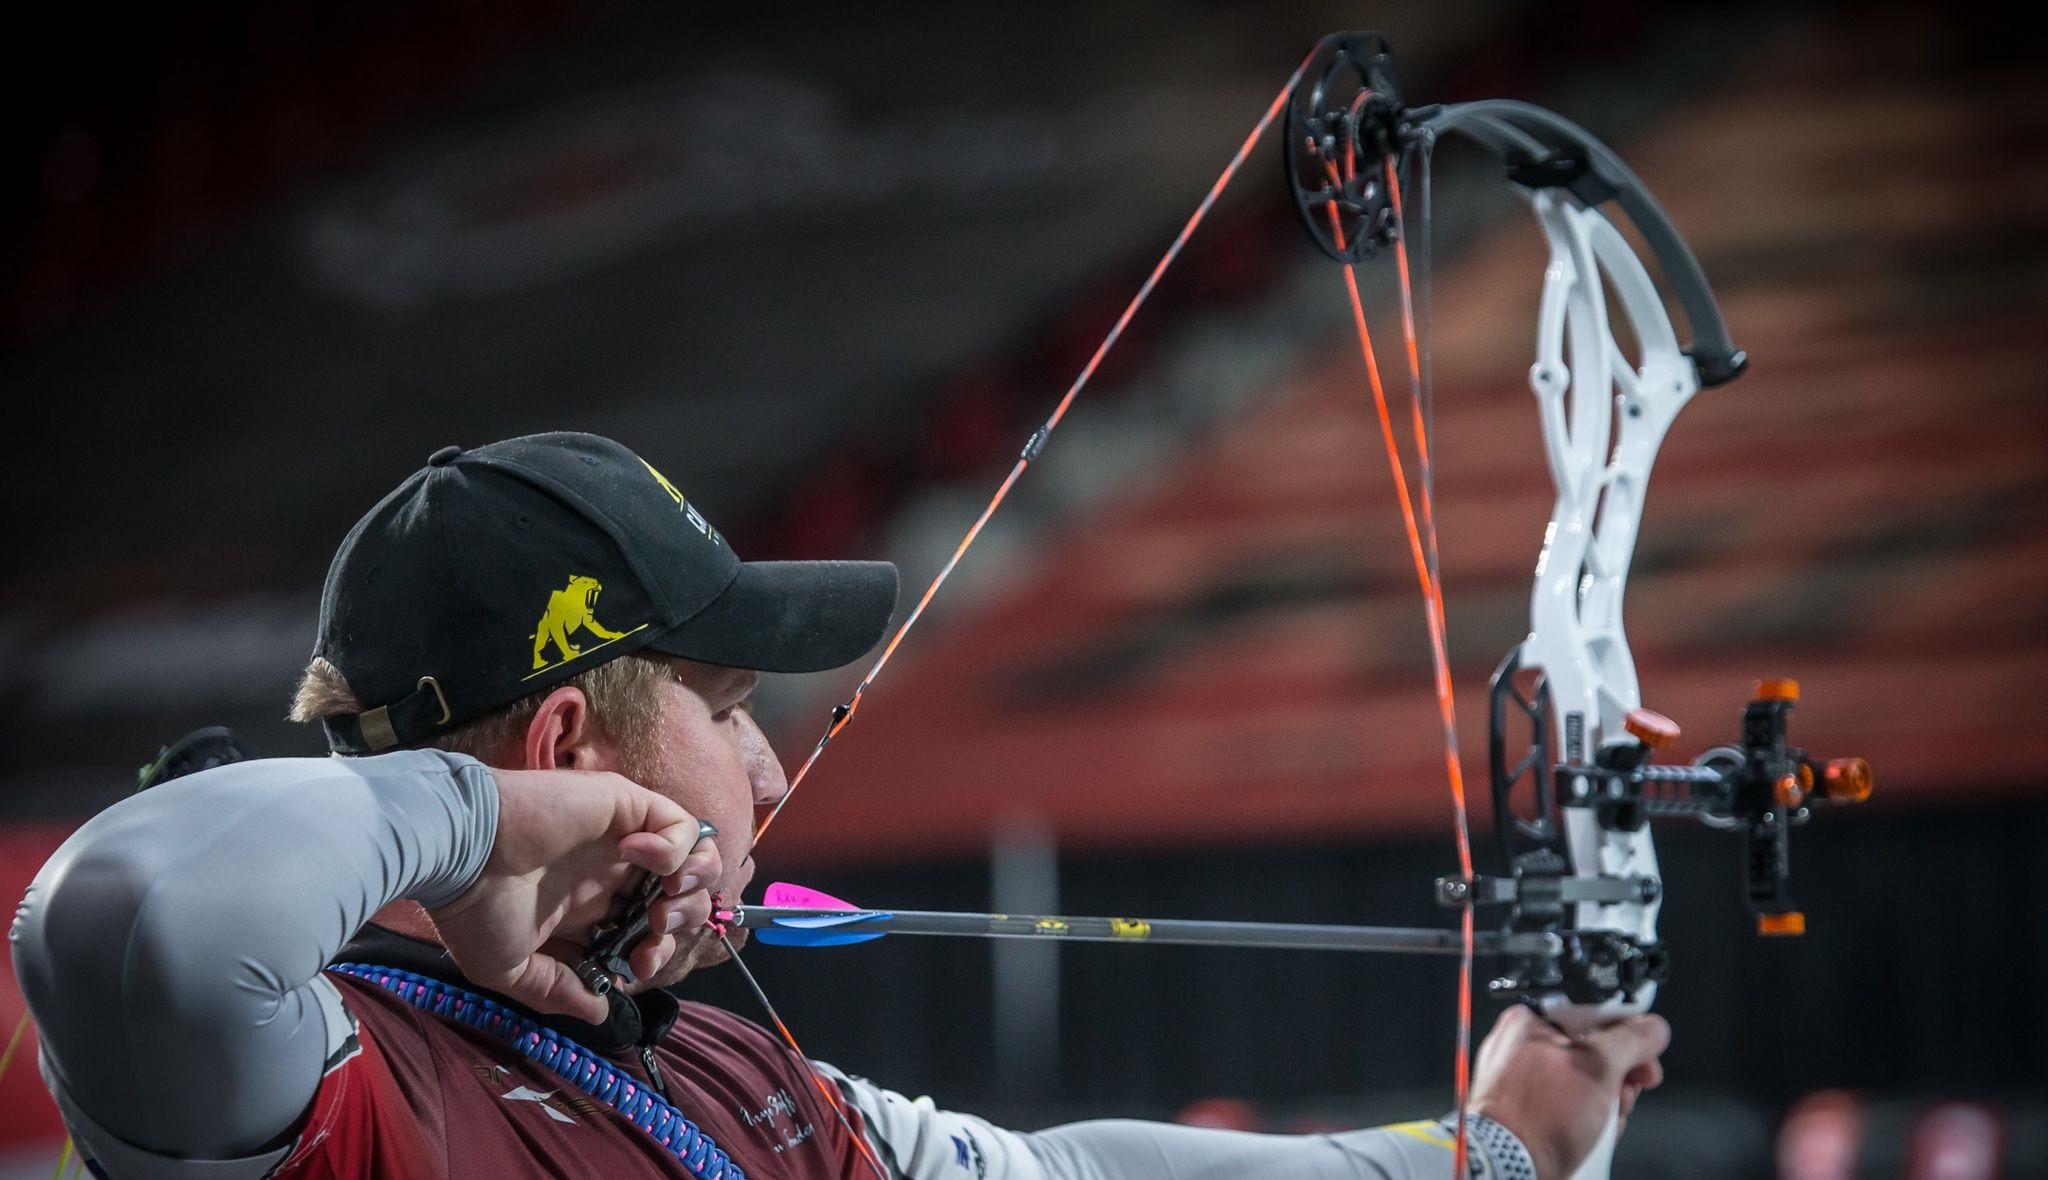 New Zealand's Riku Van Tonder will be looking to make his mark in Macau ©World Archery